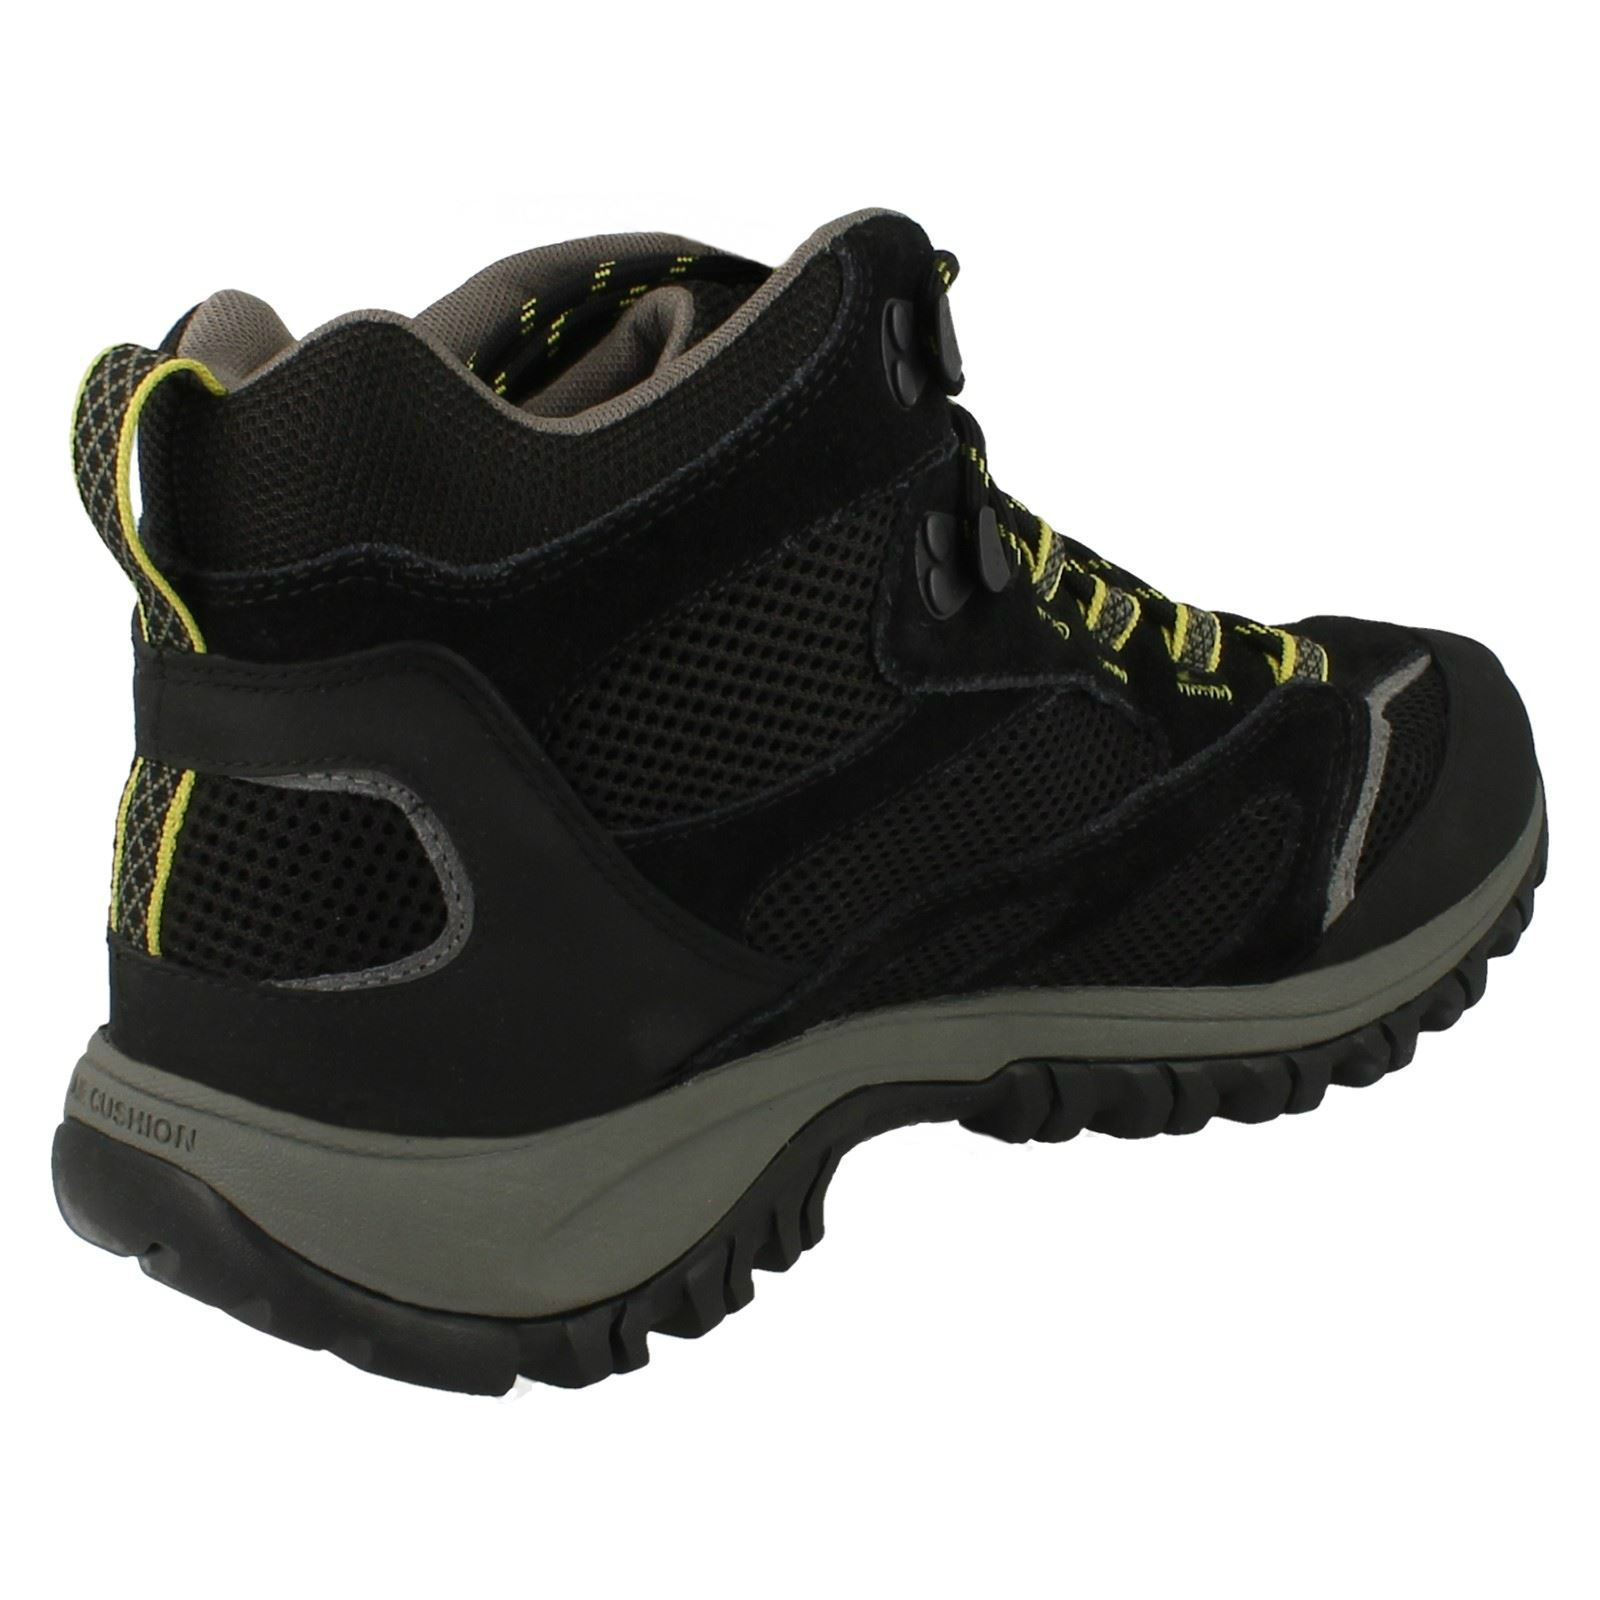 thumbnail 5 - Mens-Merrell-Waterproof-Walking-Boots-Phoenix-Mid